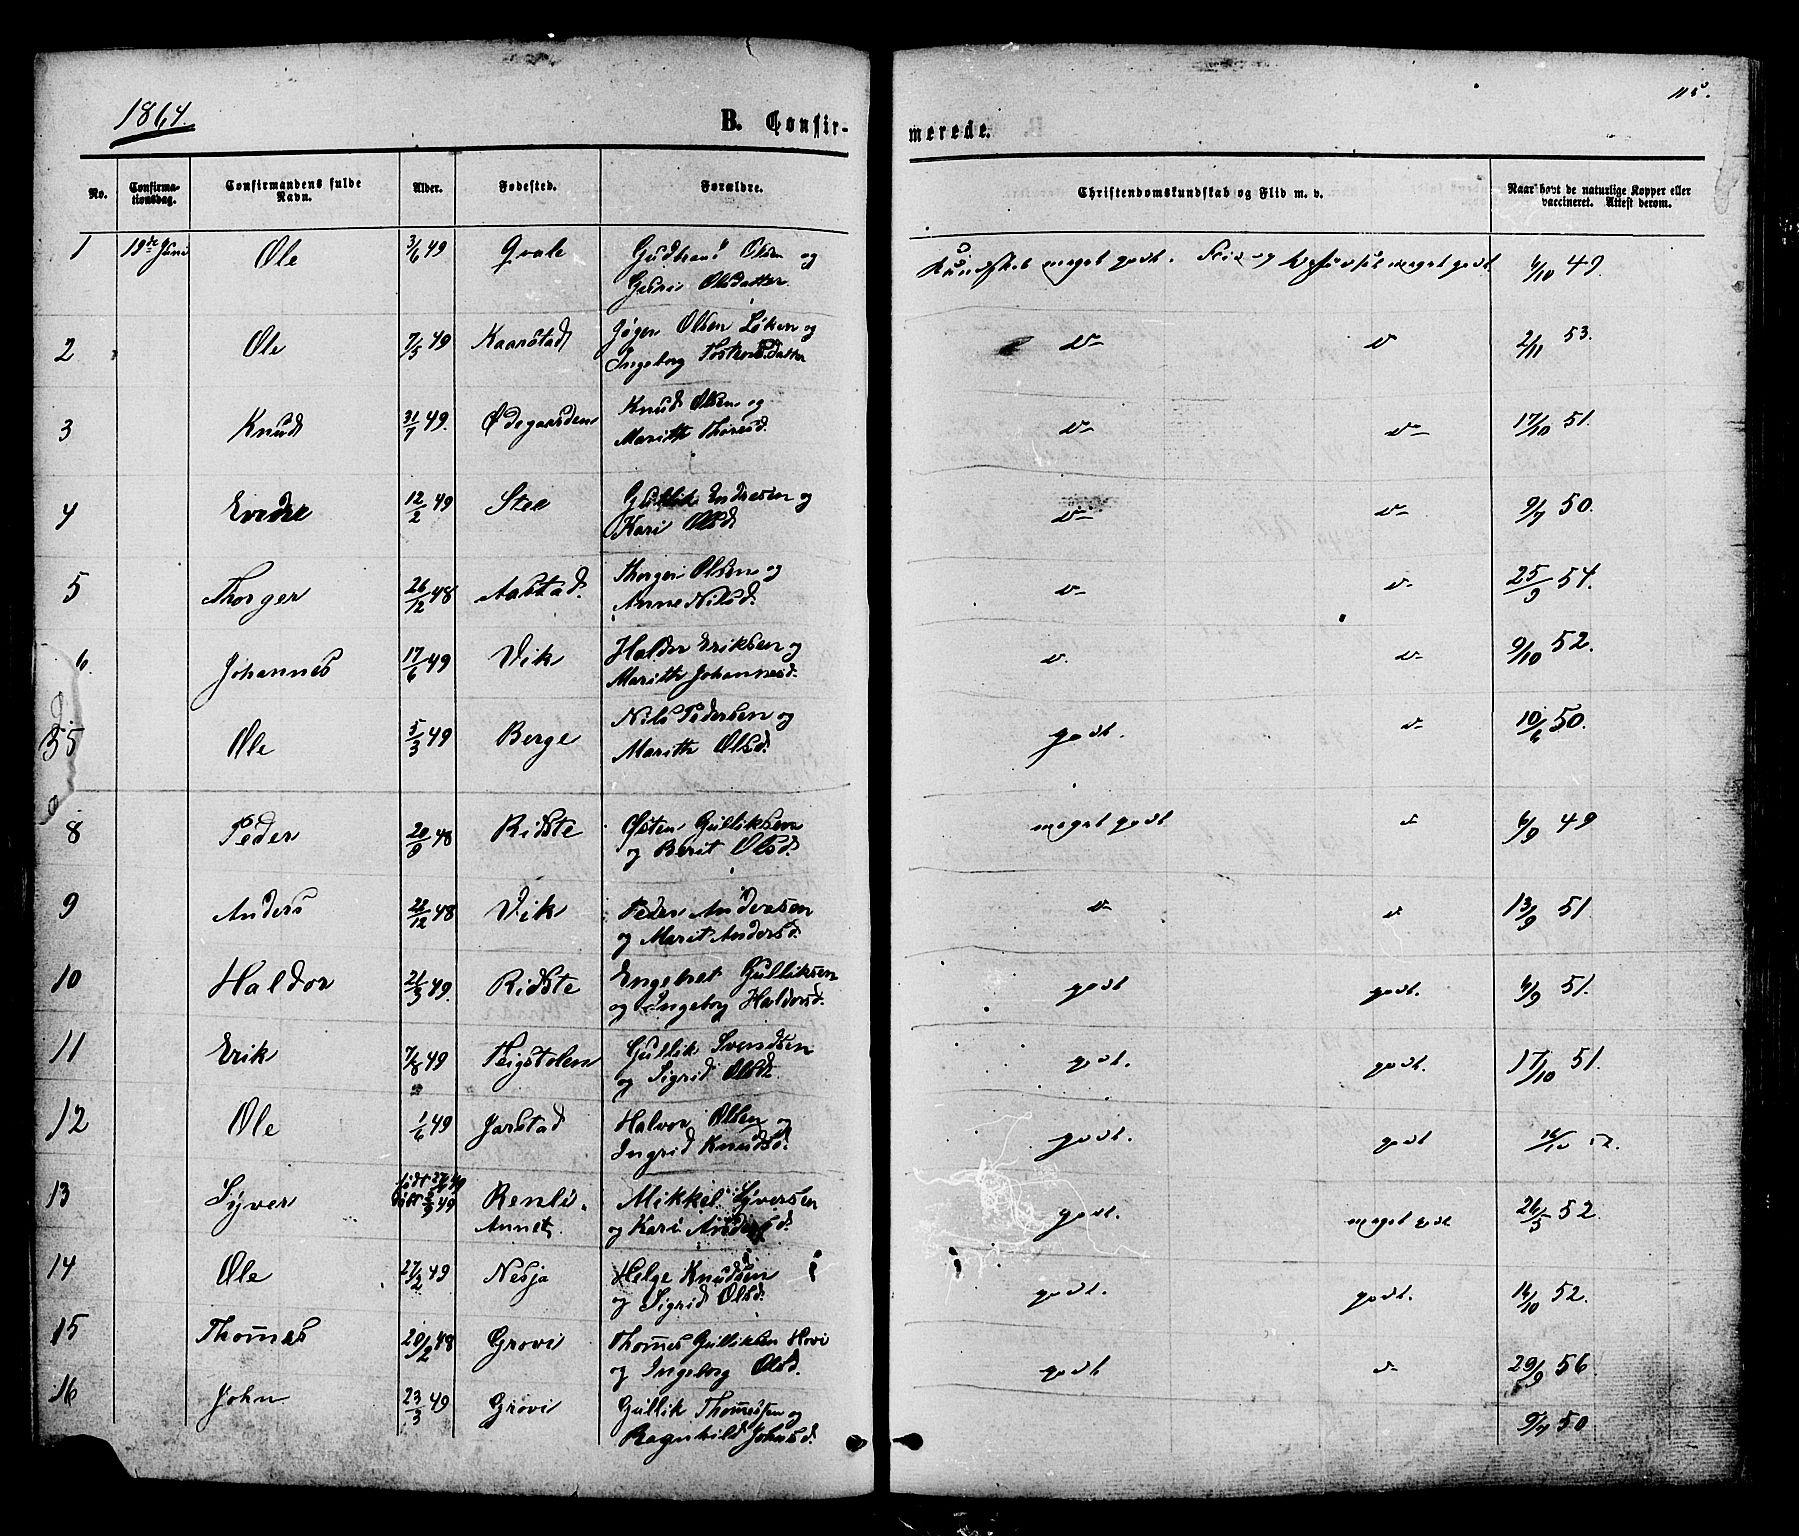 SAH, Vestre Slidre prestekontor, Ministerialbok nr. 3, 1865-1880, s. 115